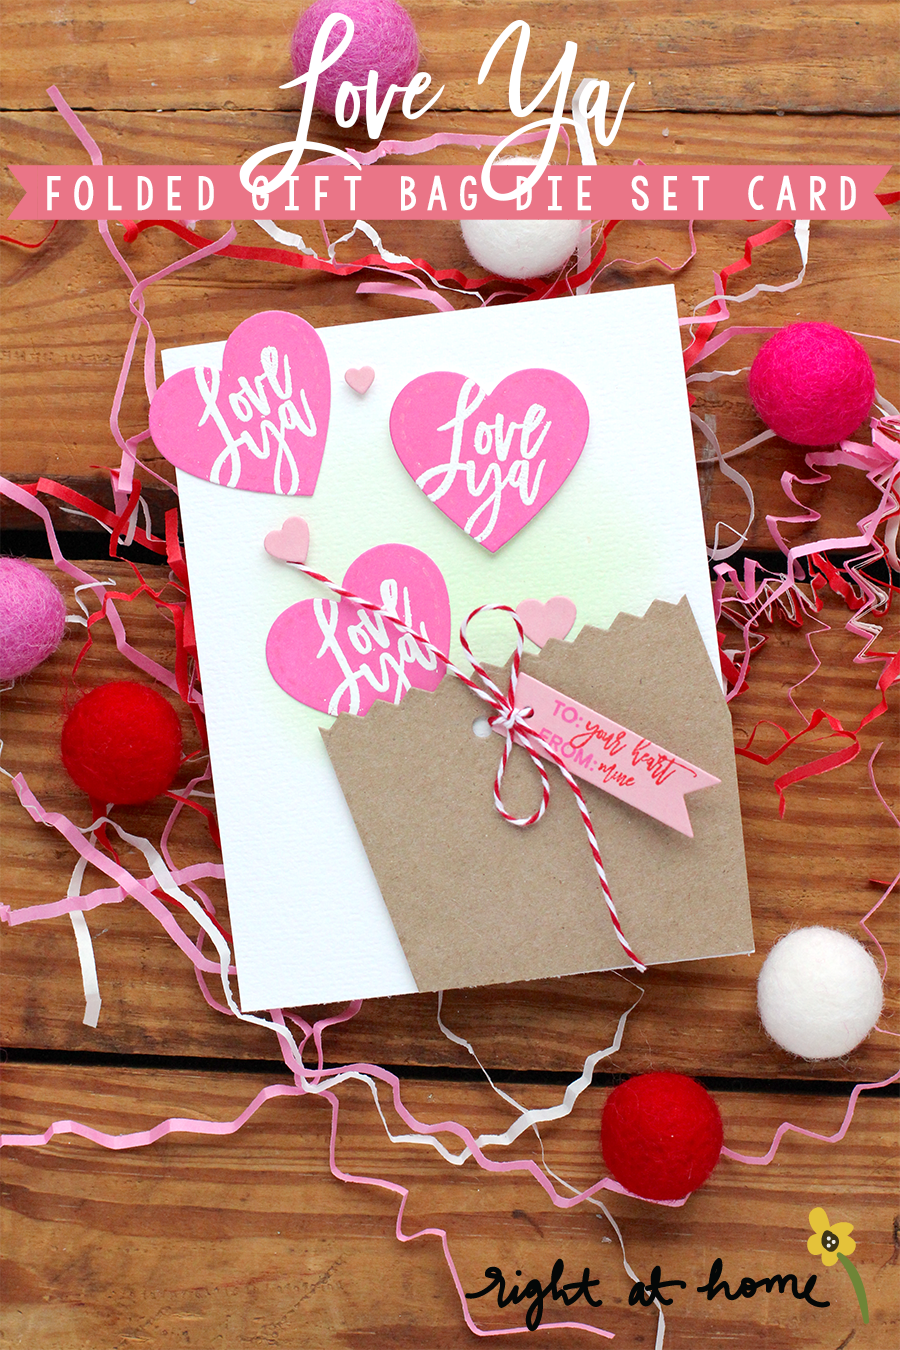 Day #5: Love Ya Folded Gift Bag Die Set Card // rightathomeshop.com/blog